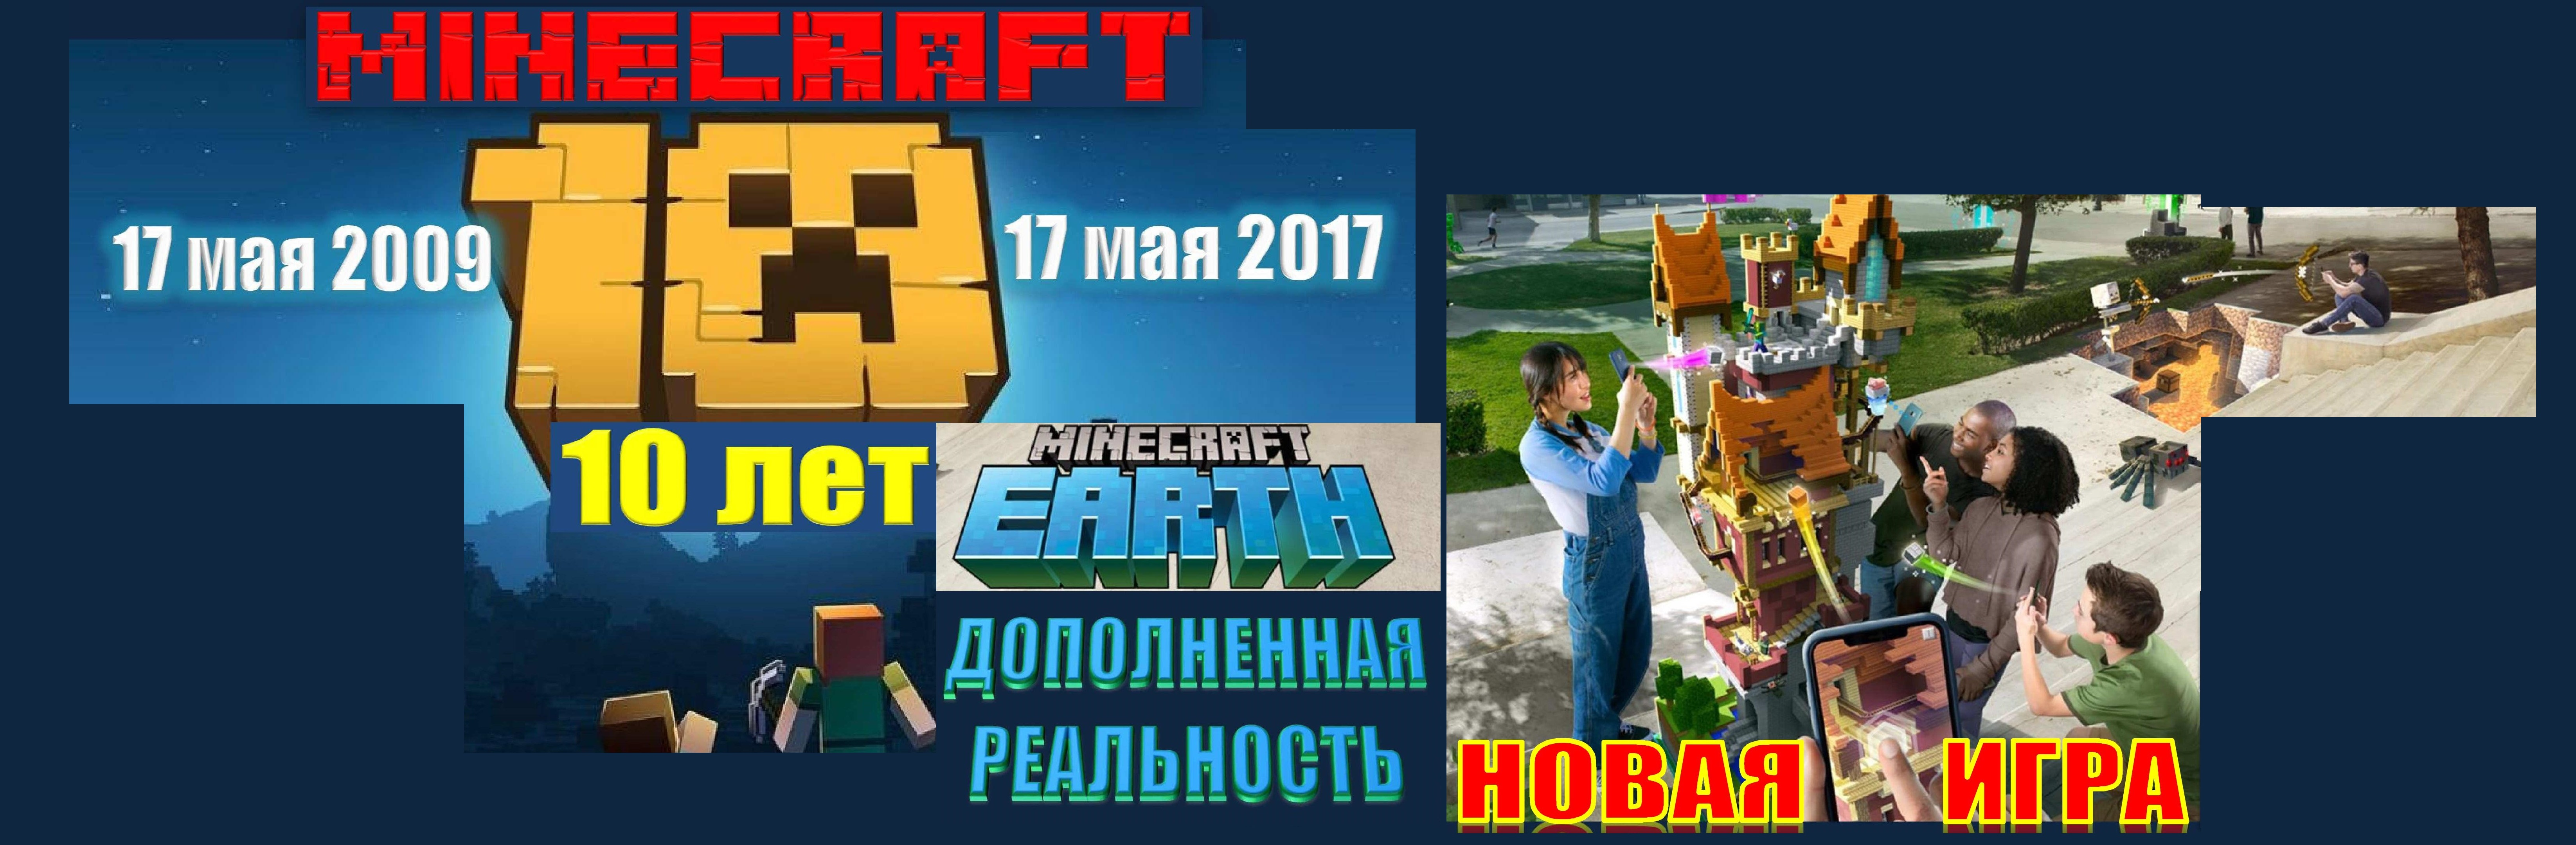 10 лет Майнкрафт обложка_фантастик.jpg